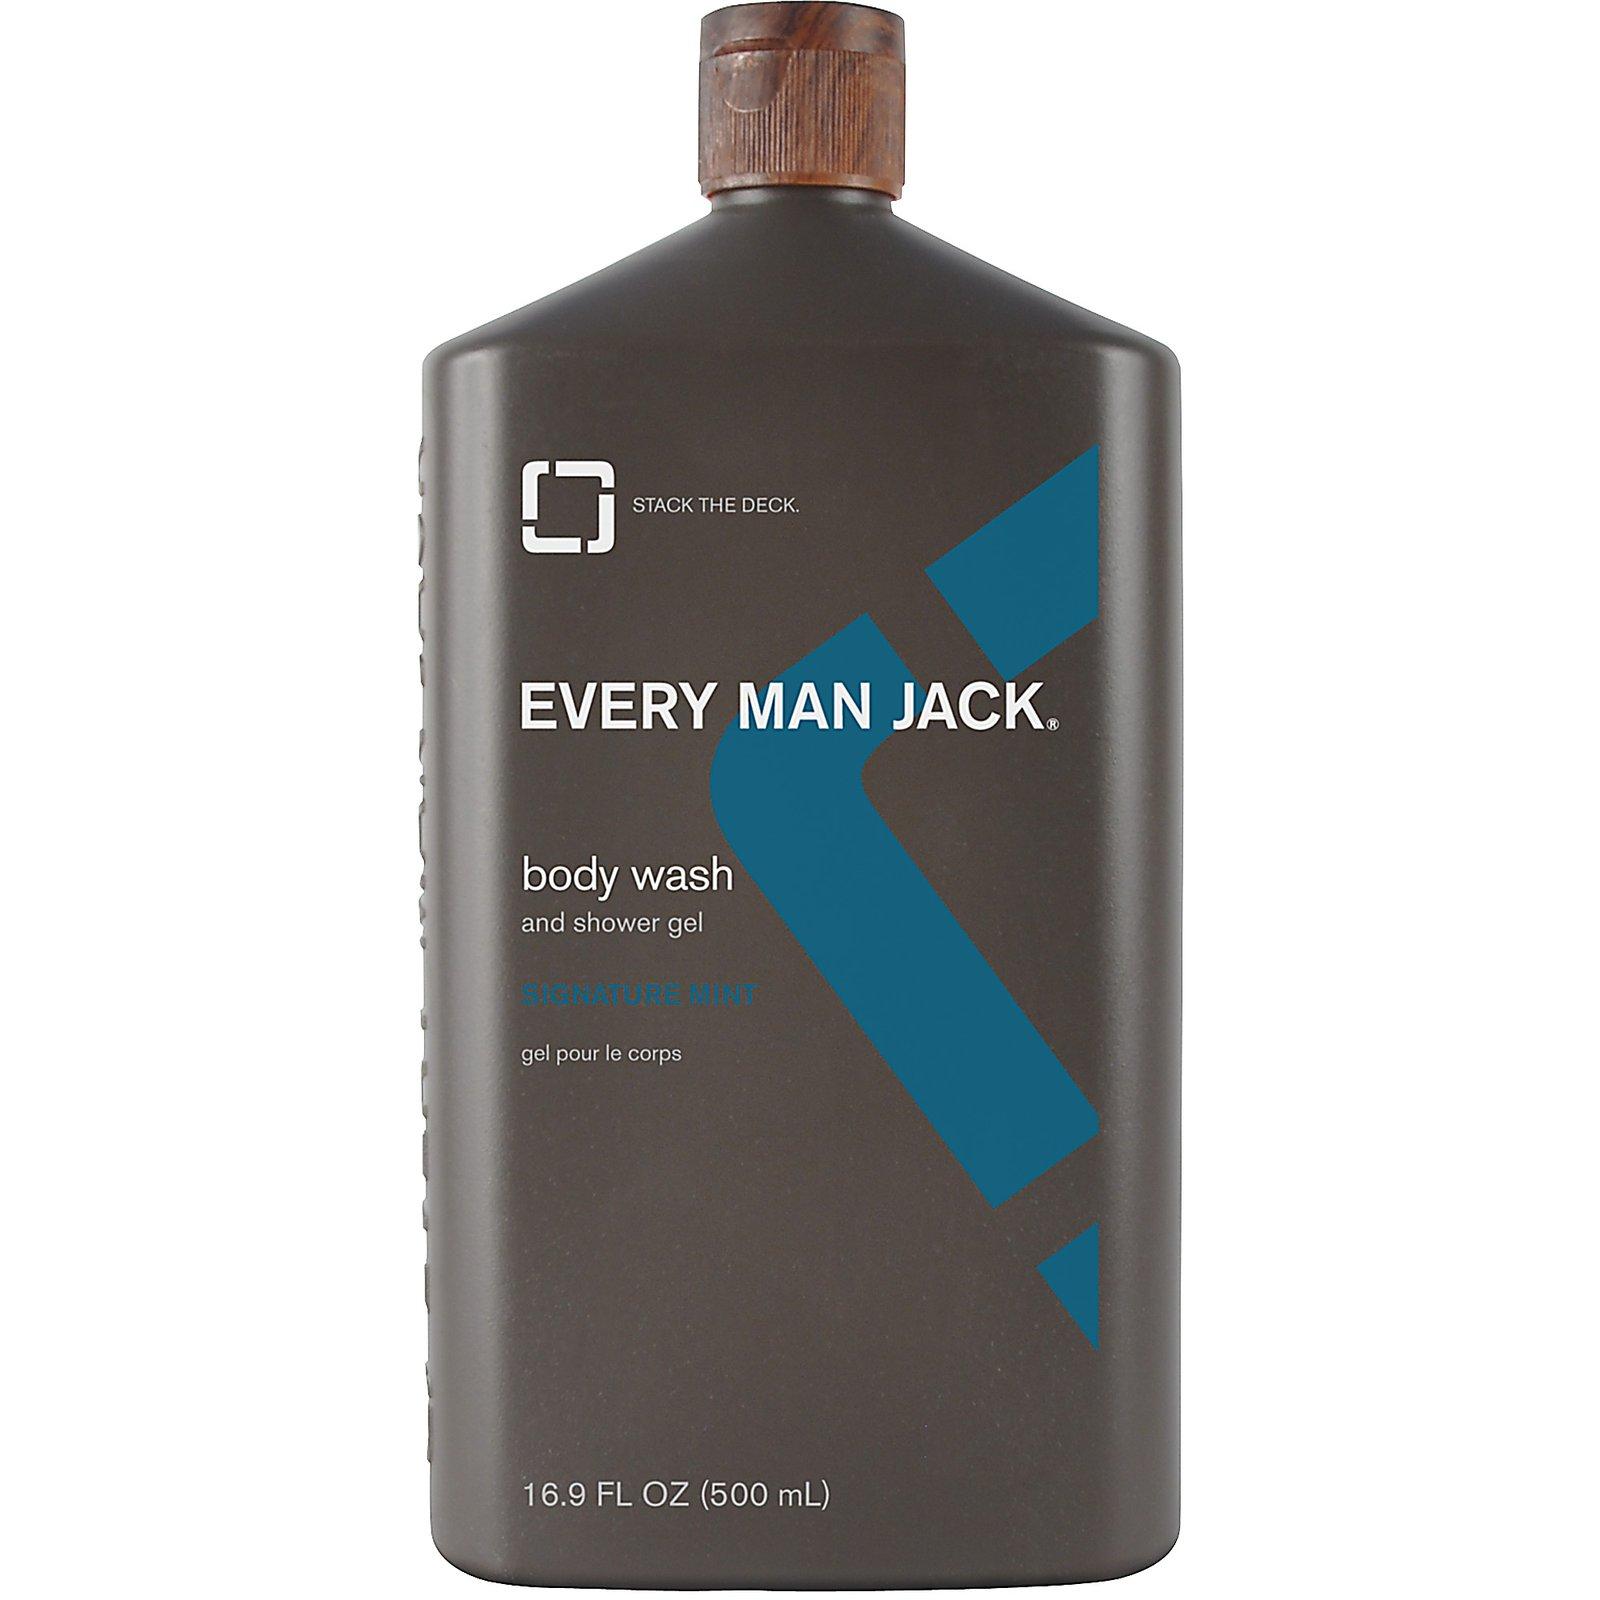 Every Man Jack Wash Signature Mint (1x16.9 Oz)